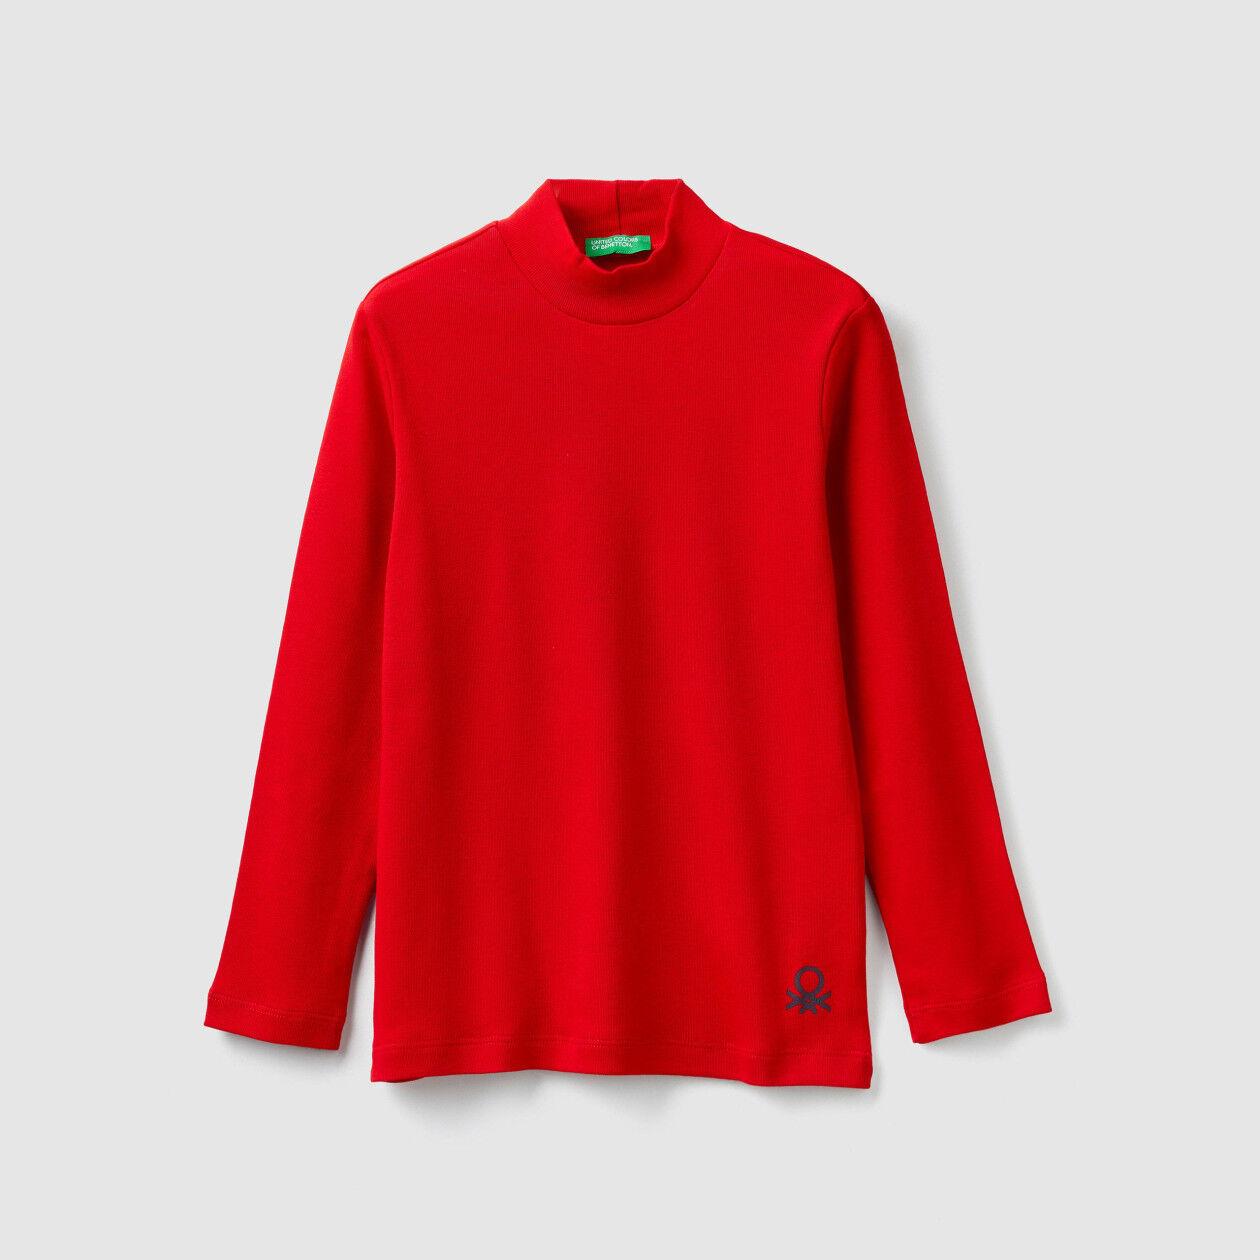 Ribbed knit turtleneck t-shirt